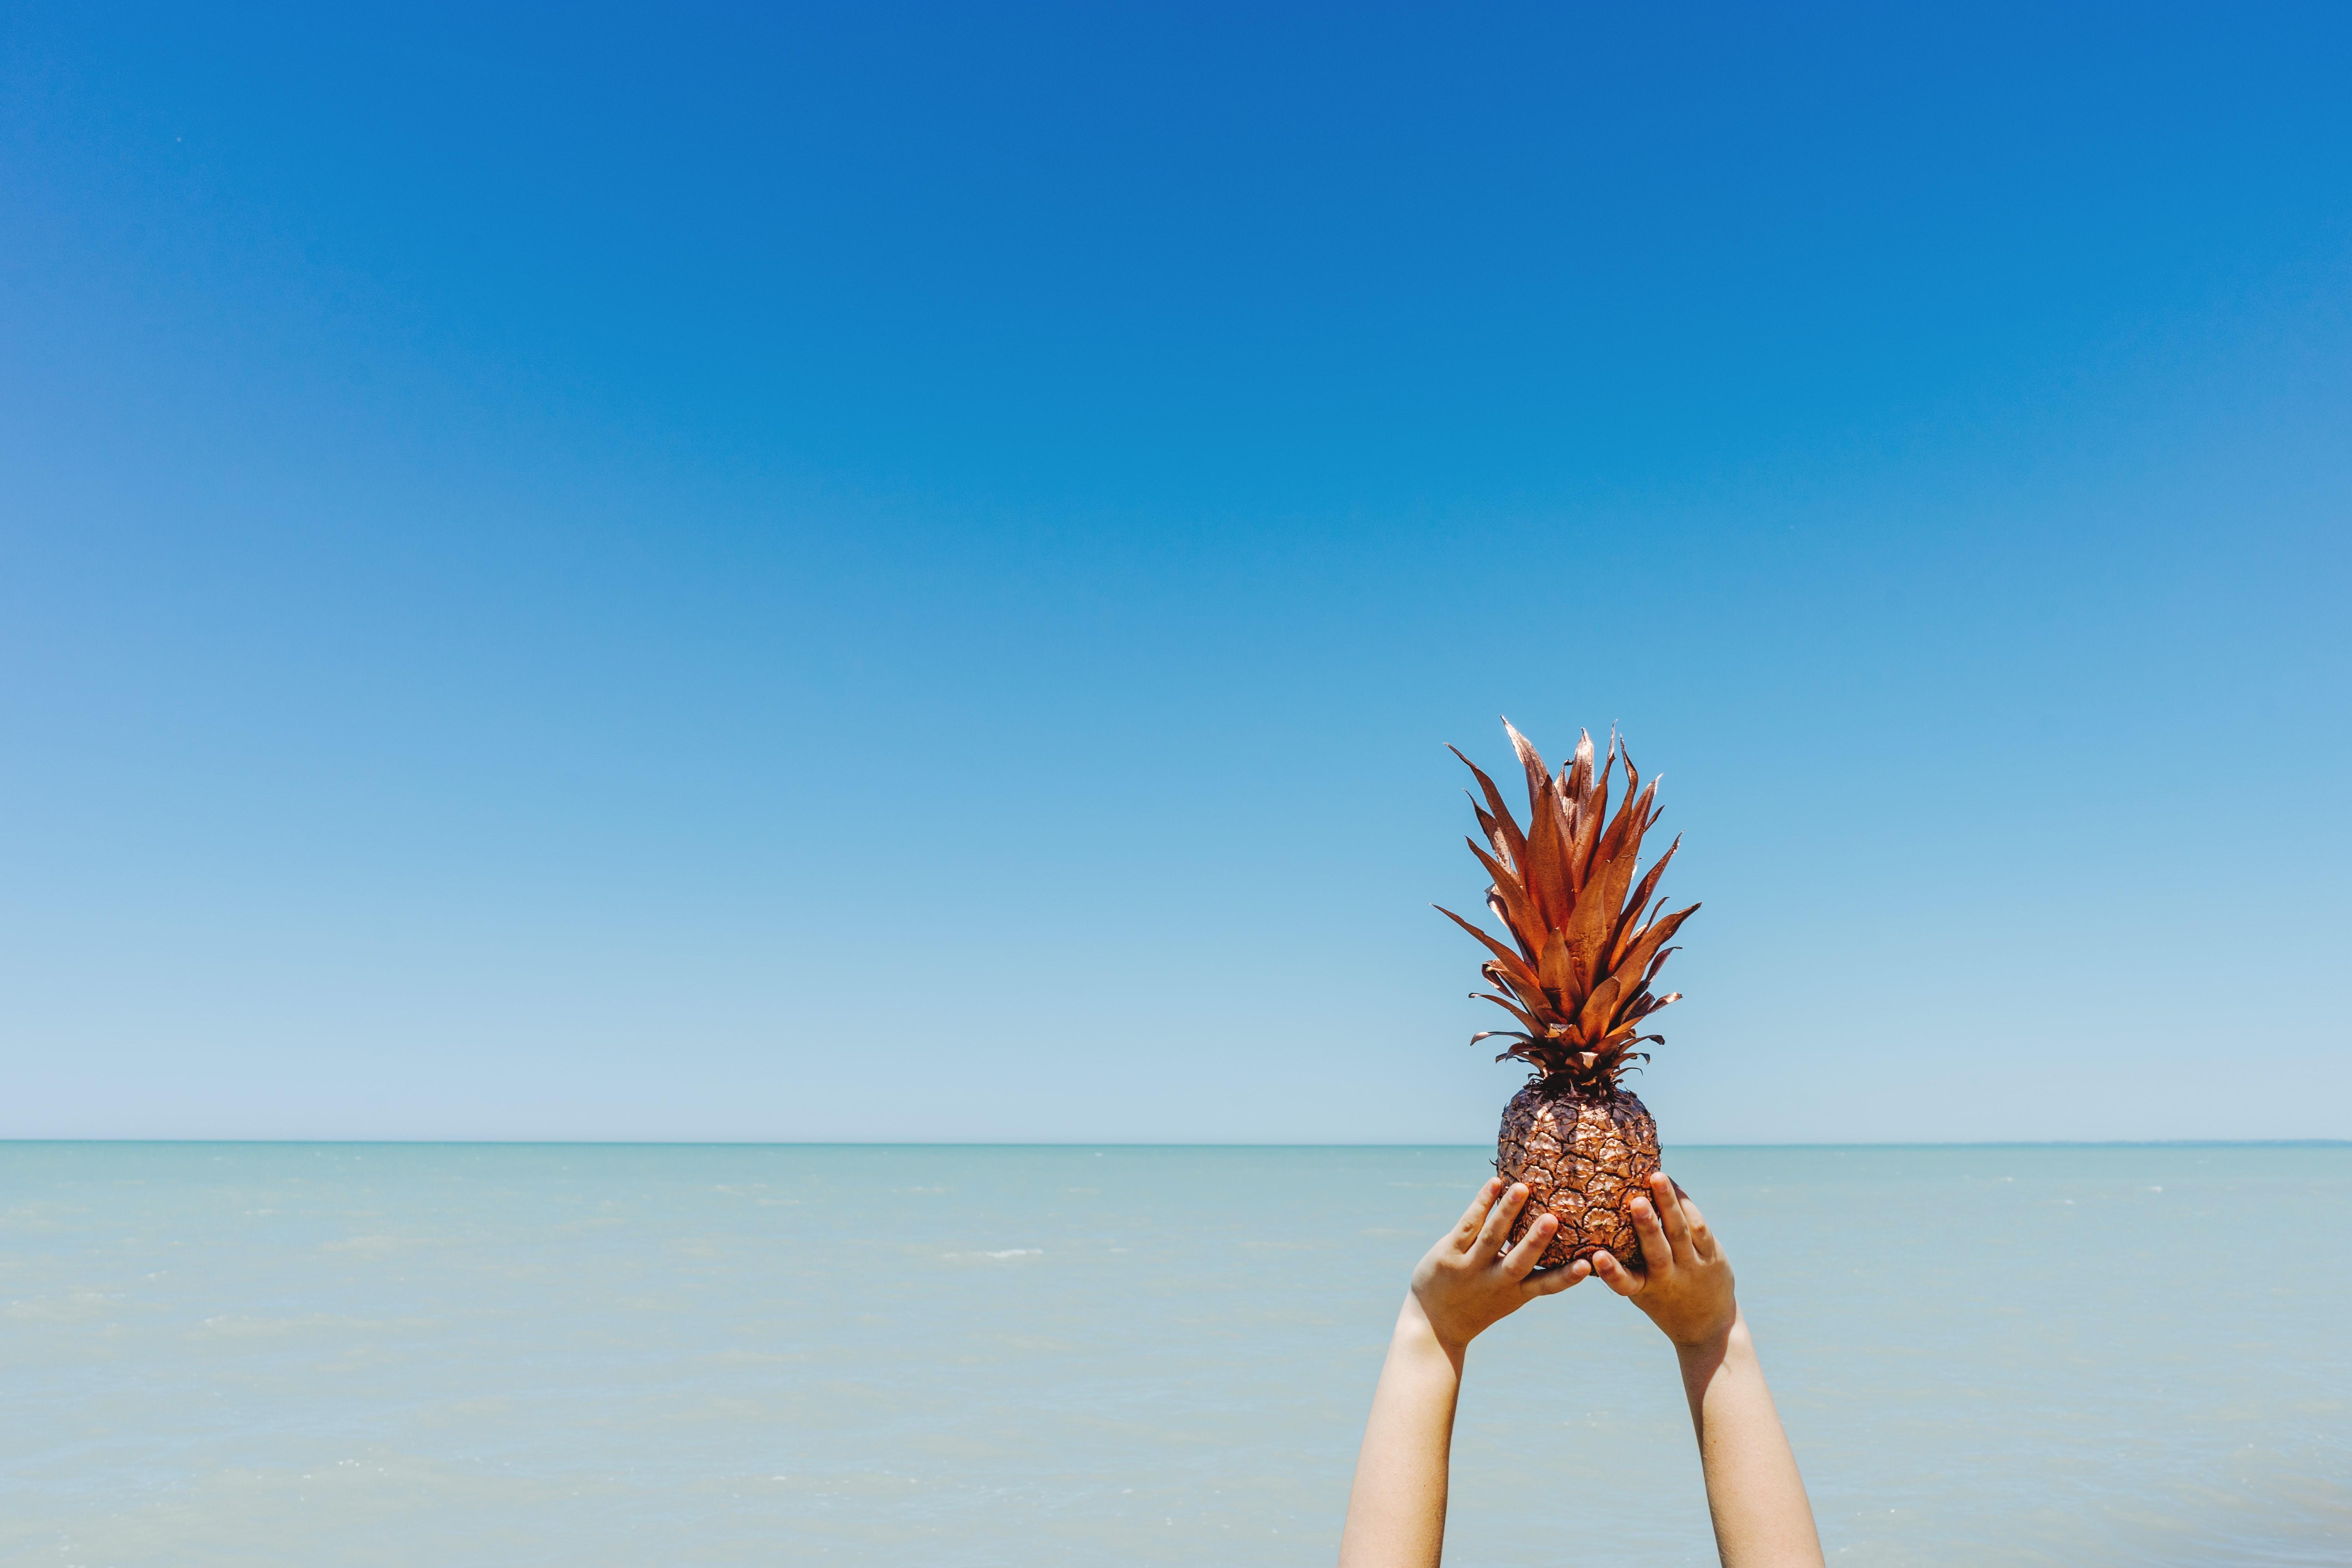 Amazing Wallpaper Mac Pineapple - pineapple-5974x3983-sky-ocean-5k-15338  You Should Have_45895.jpg